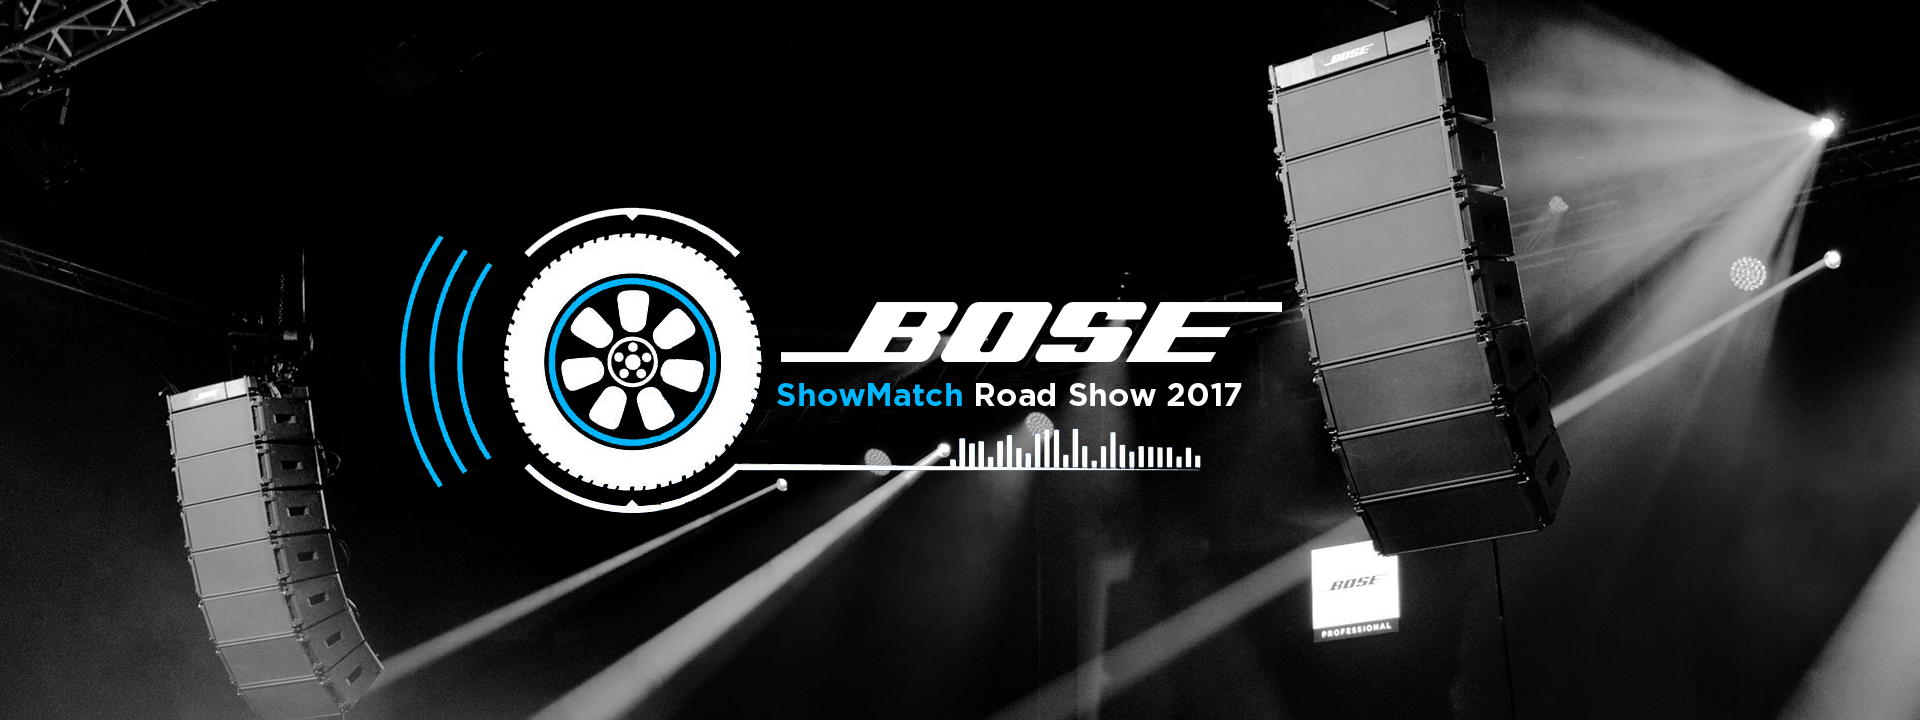 BOSE ShowMatch Road Show 2017